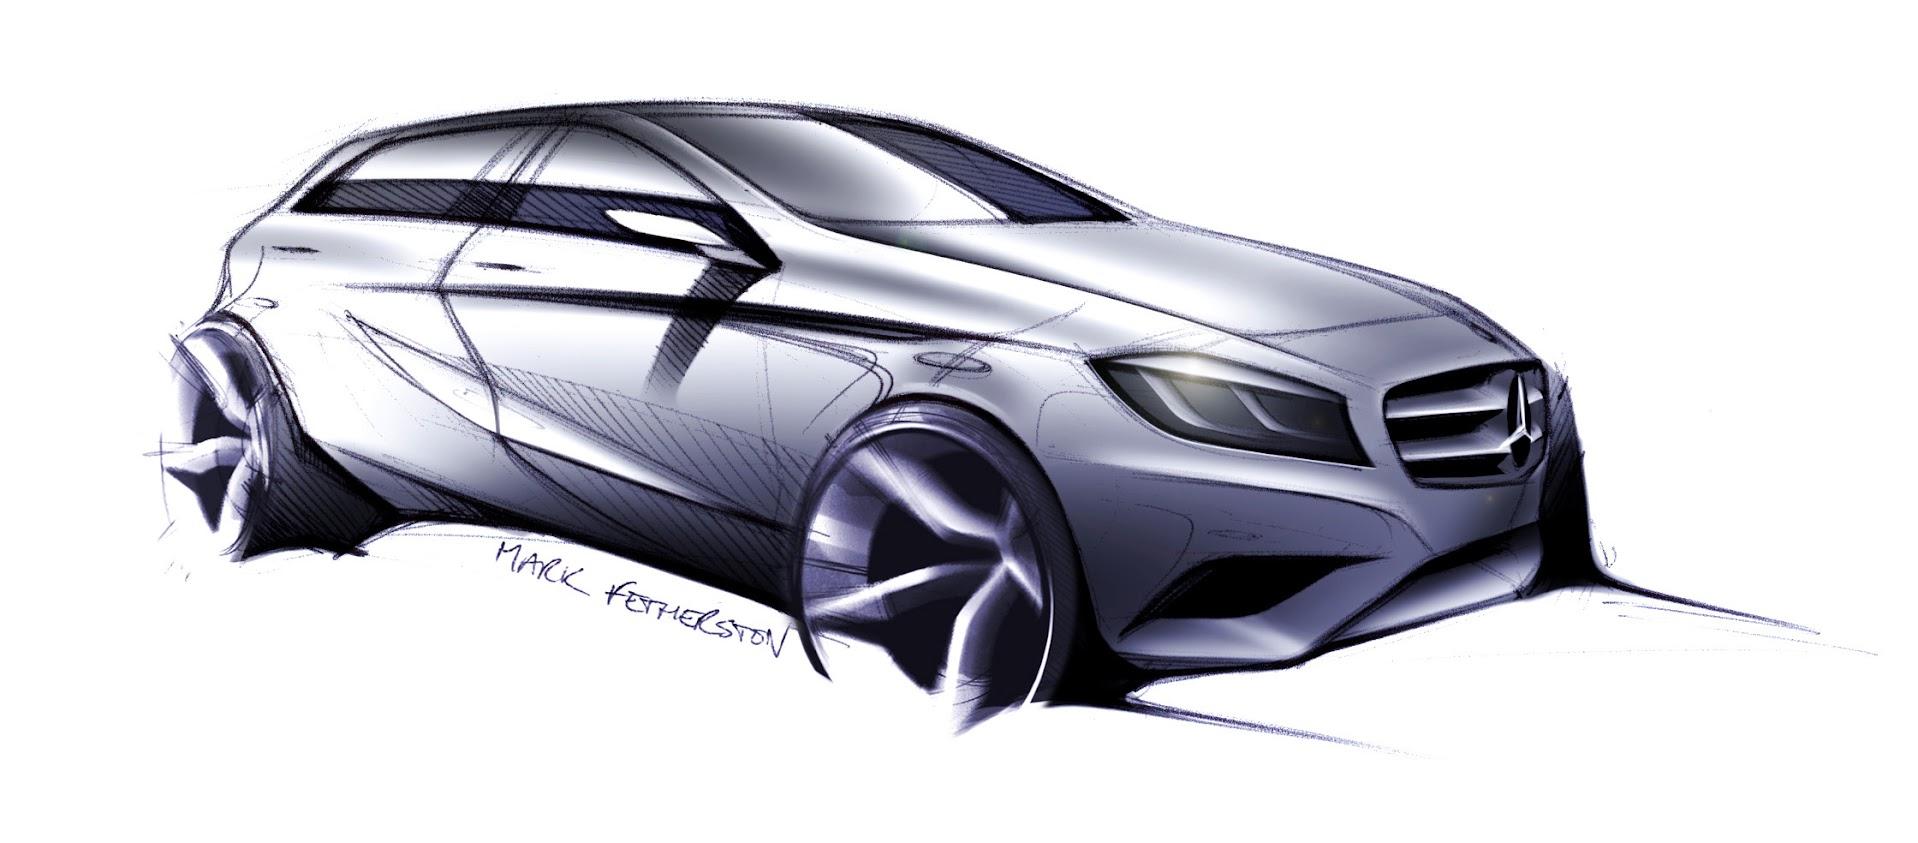 *Mercedes-Benz The new A-Class 跟著蔡依林搭載小鋼砲新血來襲:「PROJECT A+」萬人電音派對! 17